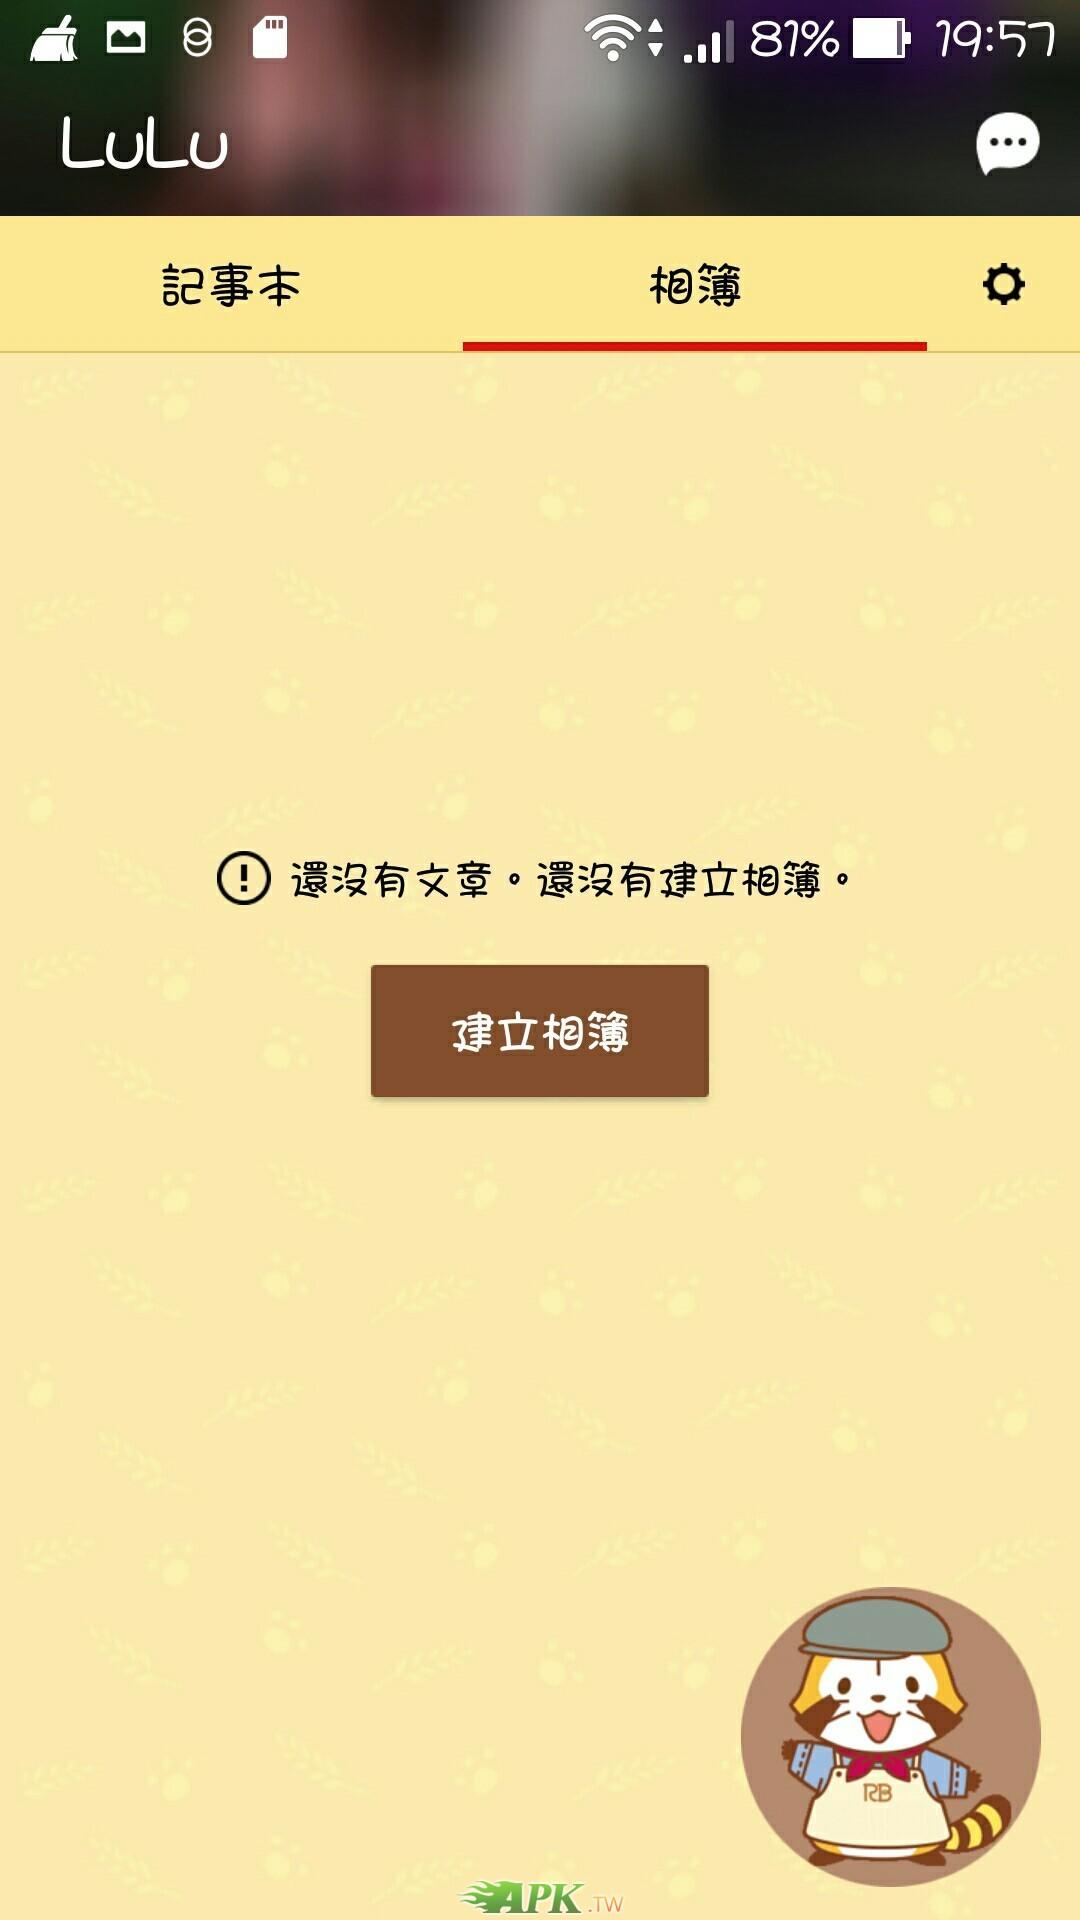 02bb.jpg